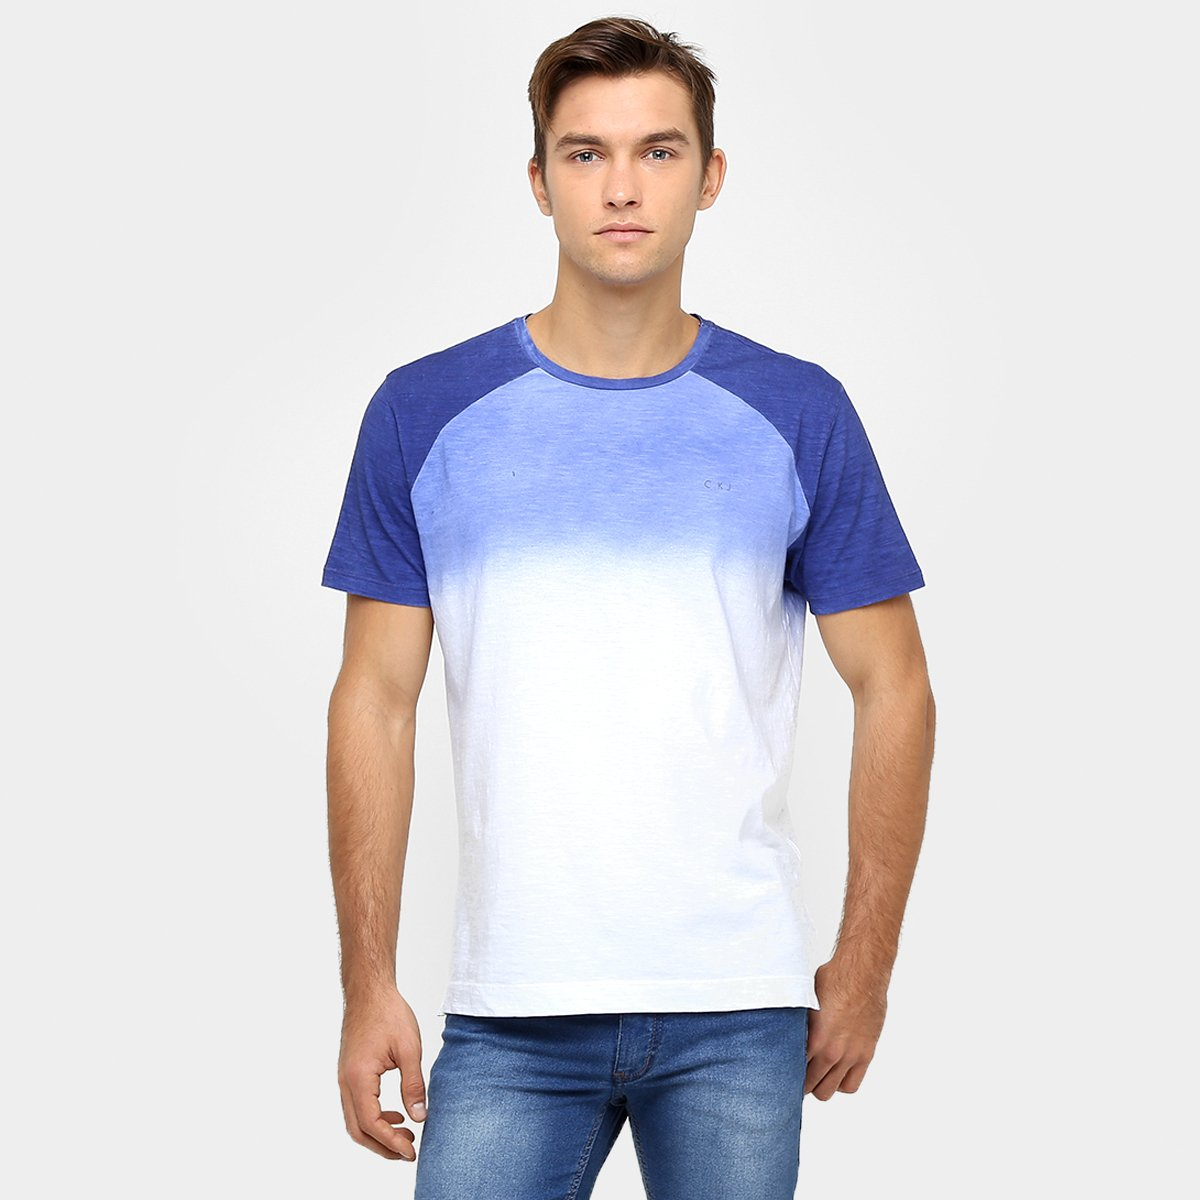 f8f1d053ad671 Camiseta Calvin Klein Raglan Jateado Degradê - Compre Agora